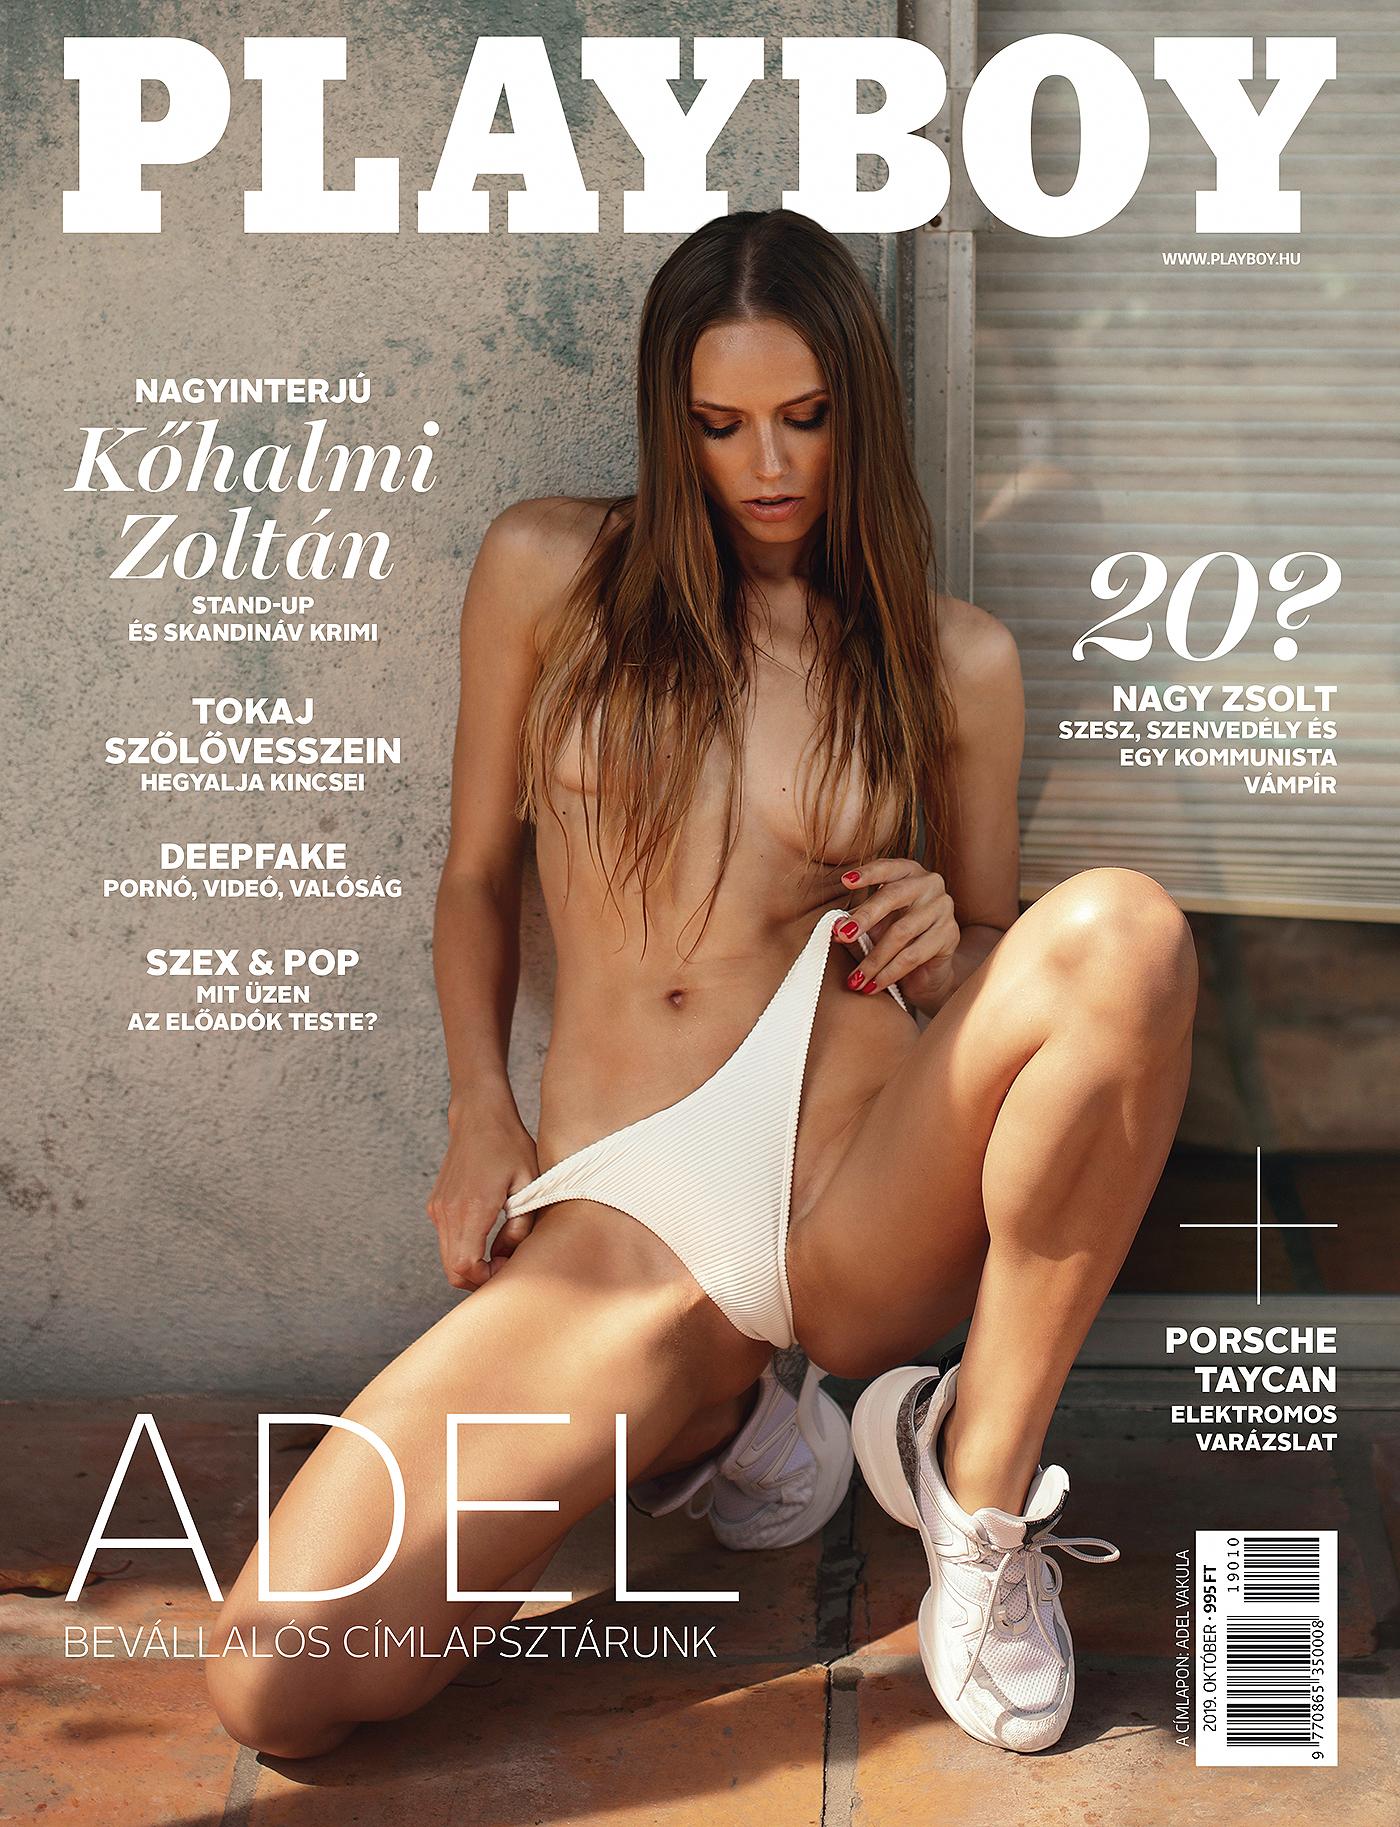 Ana Dias photographing Adel Vakula nude for Playboy magazine